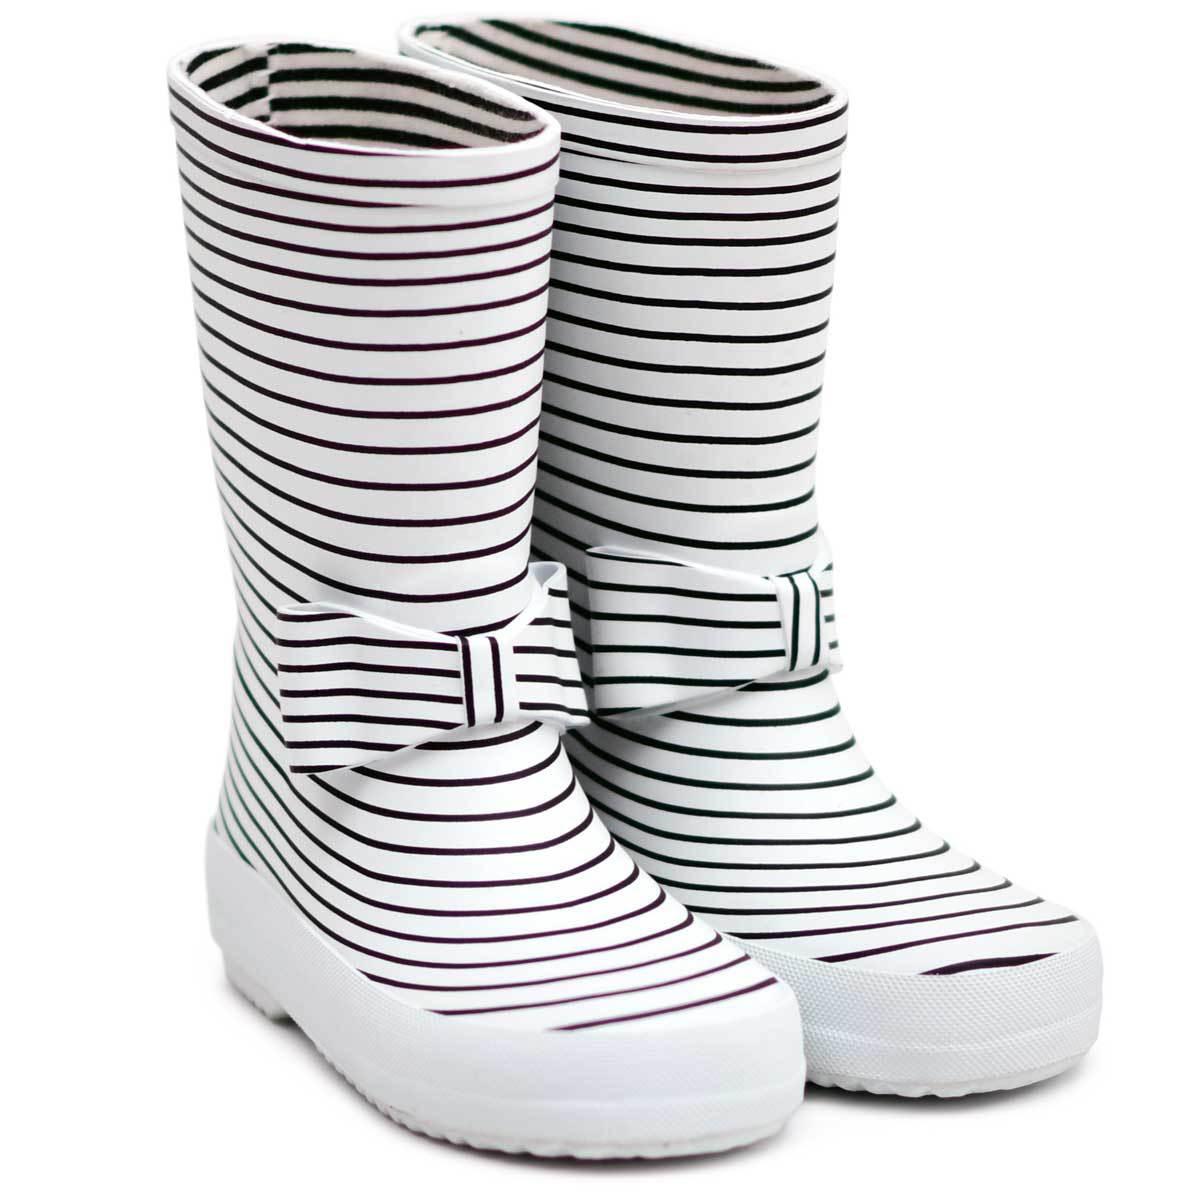 Chaussons & Chaussures Bottes Boxbonaute Bowtie - 20 Bottes Boxbonaute Bowtie - 20